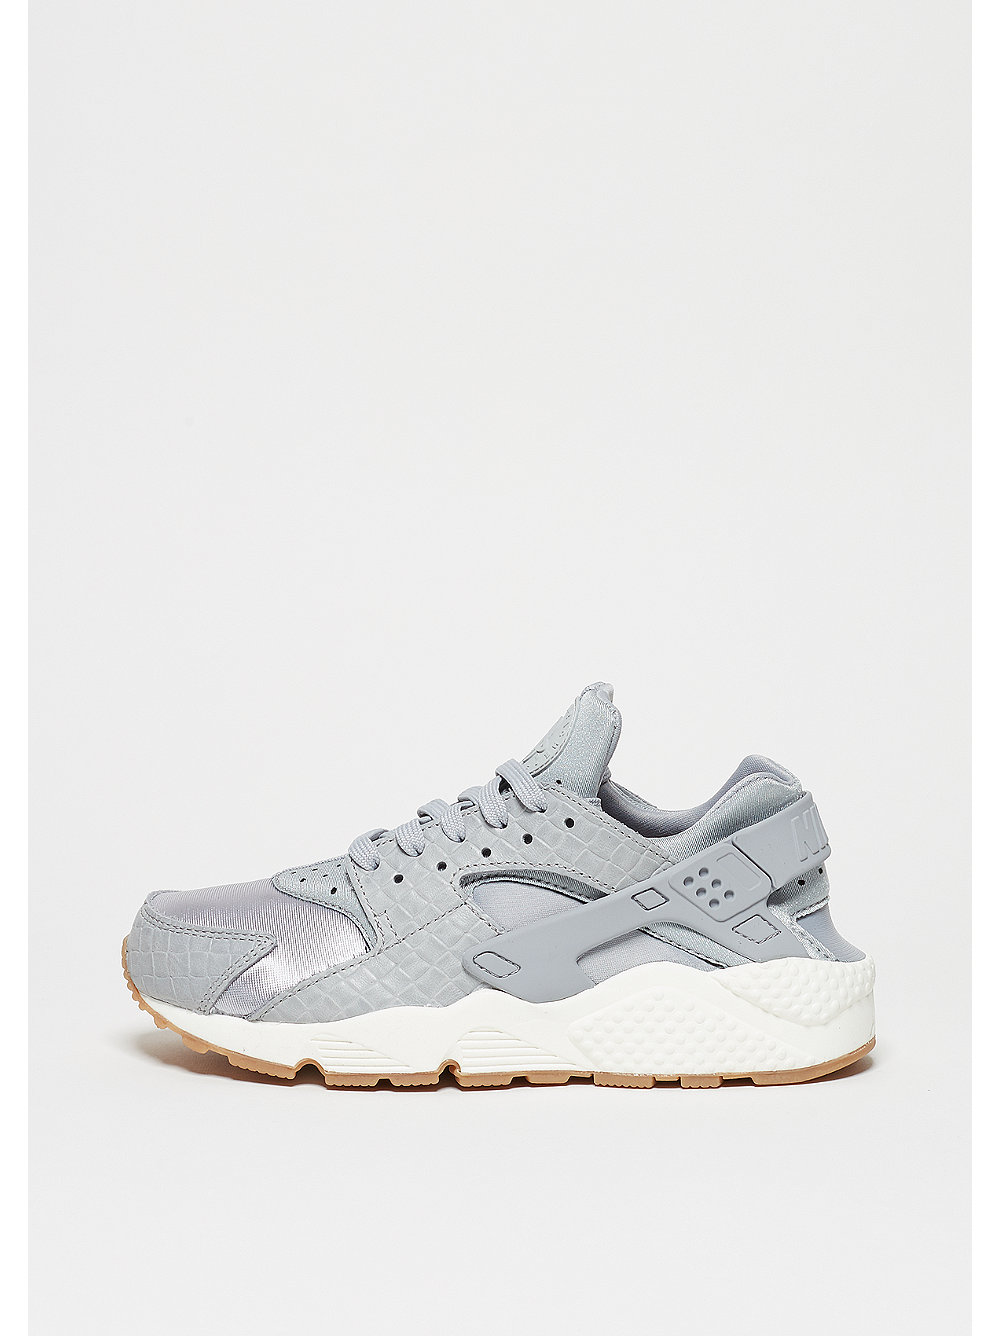 Nike Air Huarache Run damessneaker grijs en blauw